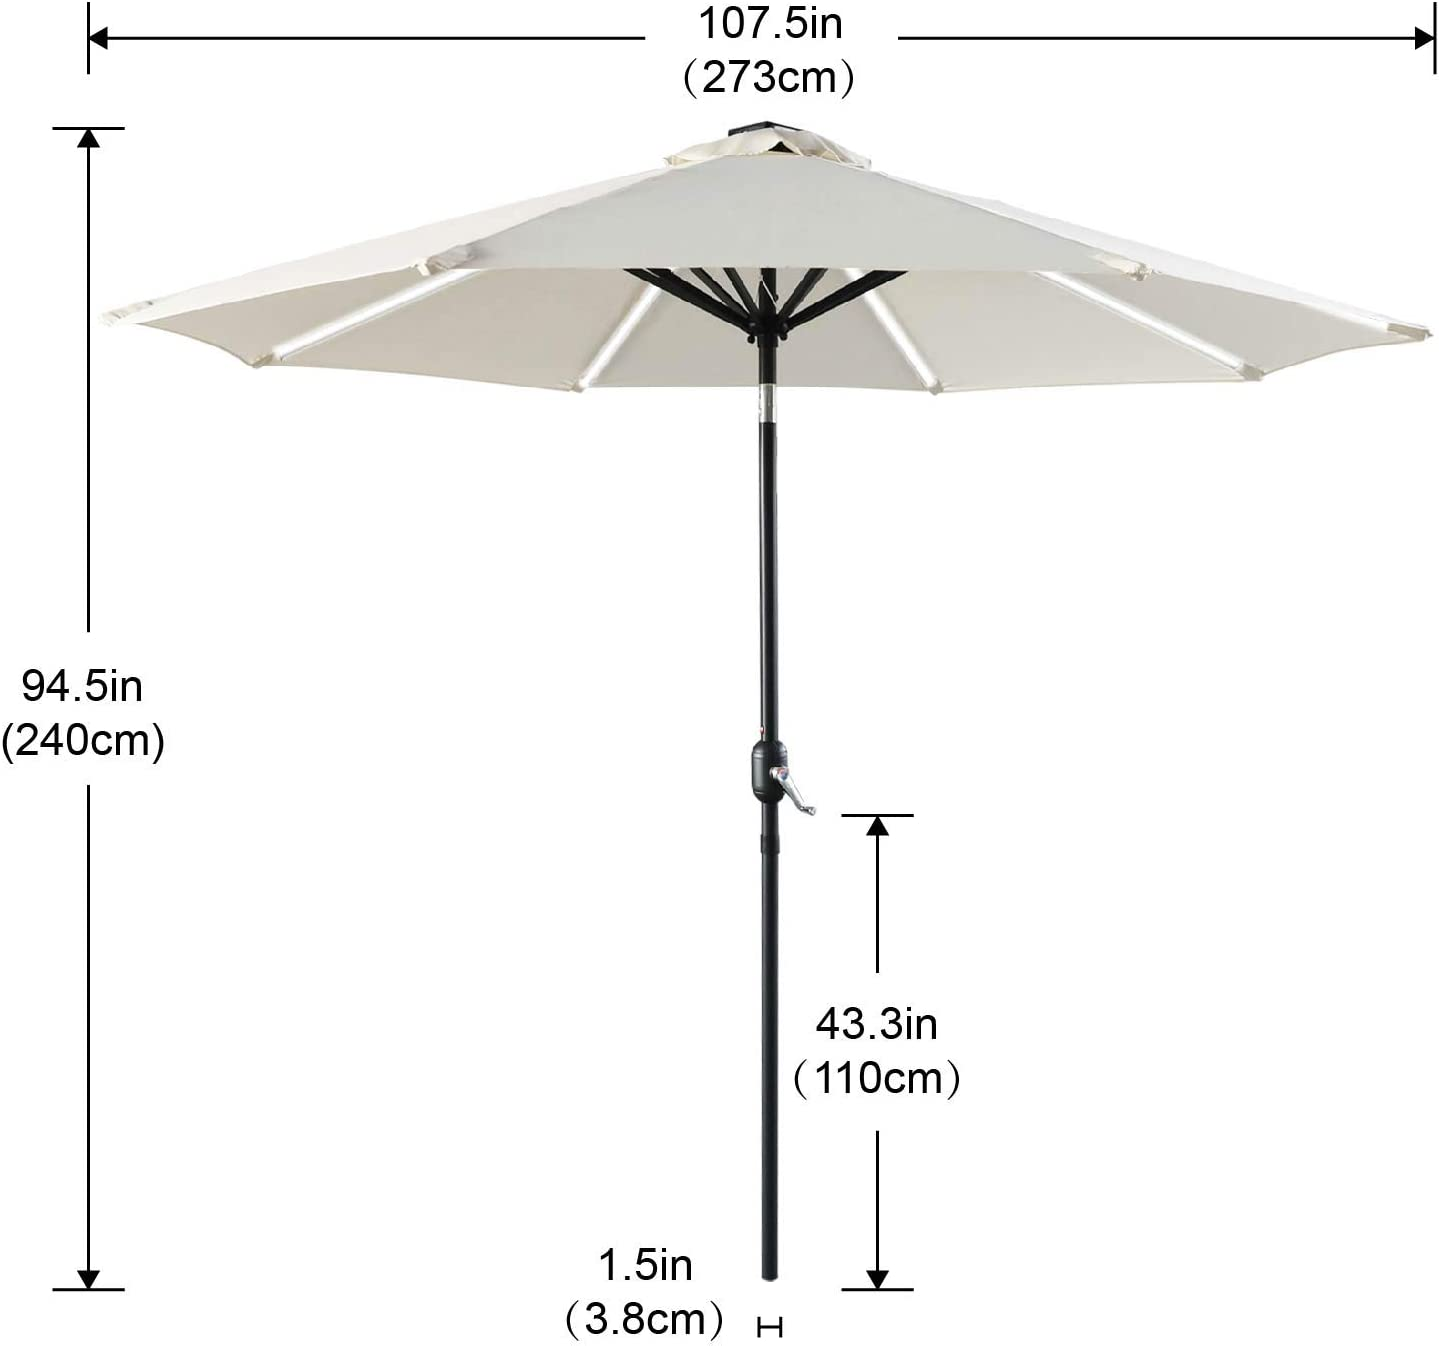 Deck Backyard and Pool Light Beige Push-Button Tilt and Crank for Garden ABCCANOPY 9FT Patio Umbrella Solar Powered Outdoor Umbrella Market Umbrella with 8LED Lights Bars